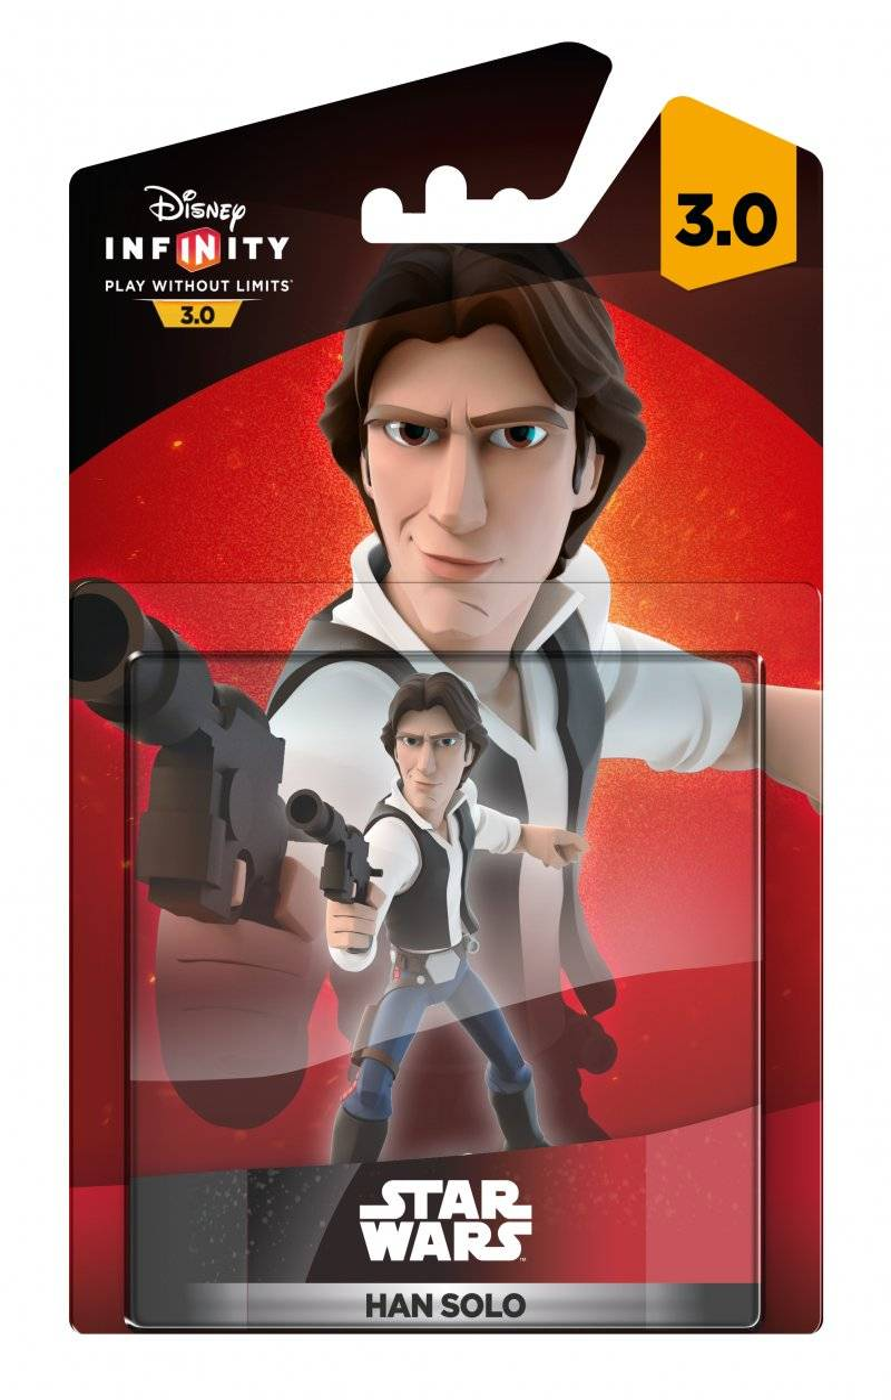 Disney Infinity 3.0 - Han Solo Figur